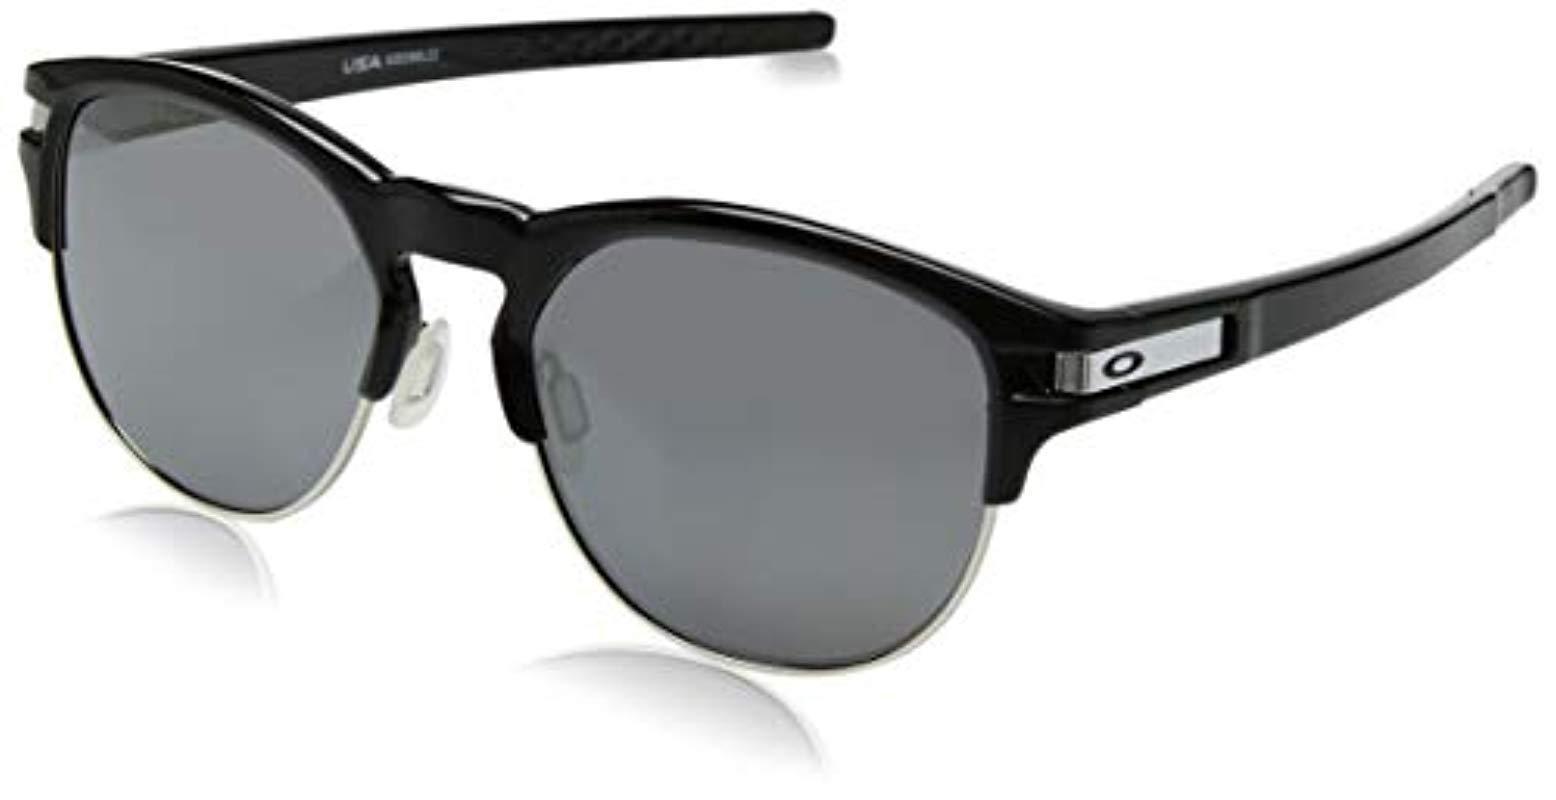 5fa8edea8d5 Oakley. Men s Latch Key 939406 Sunglasses ...